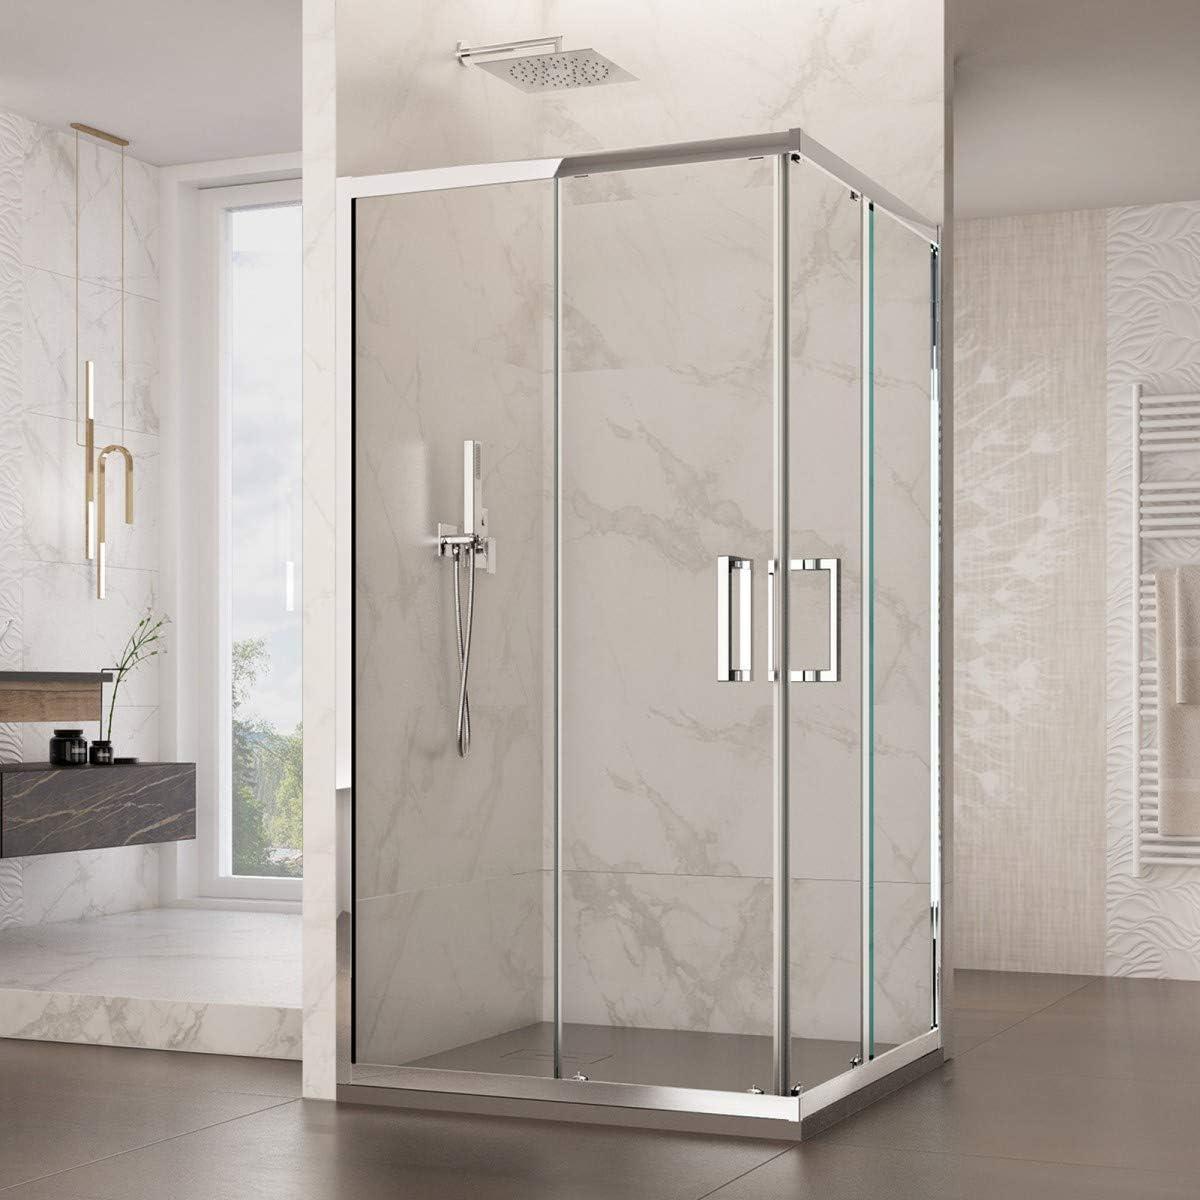 Olimpo duchas adr-tr-75 X 100 ducha con asas inoxidable angular ...